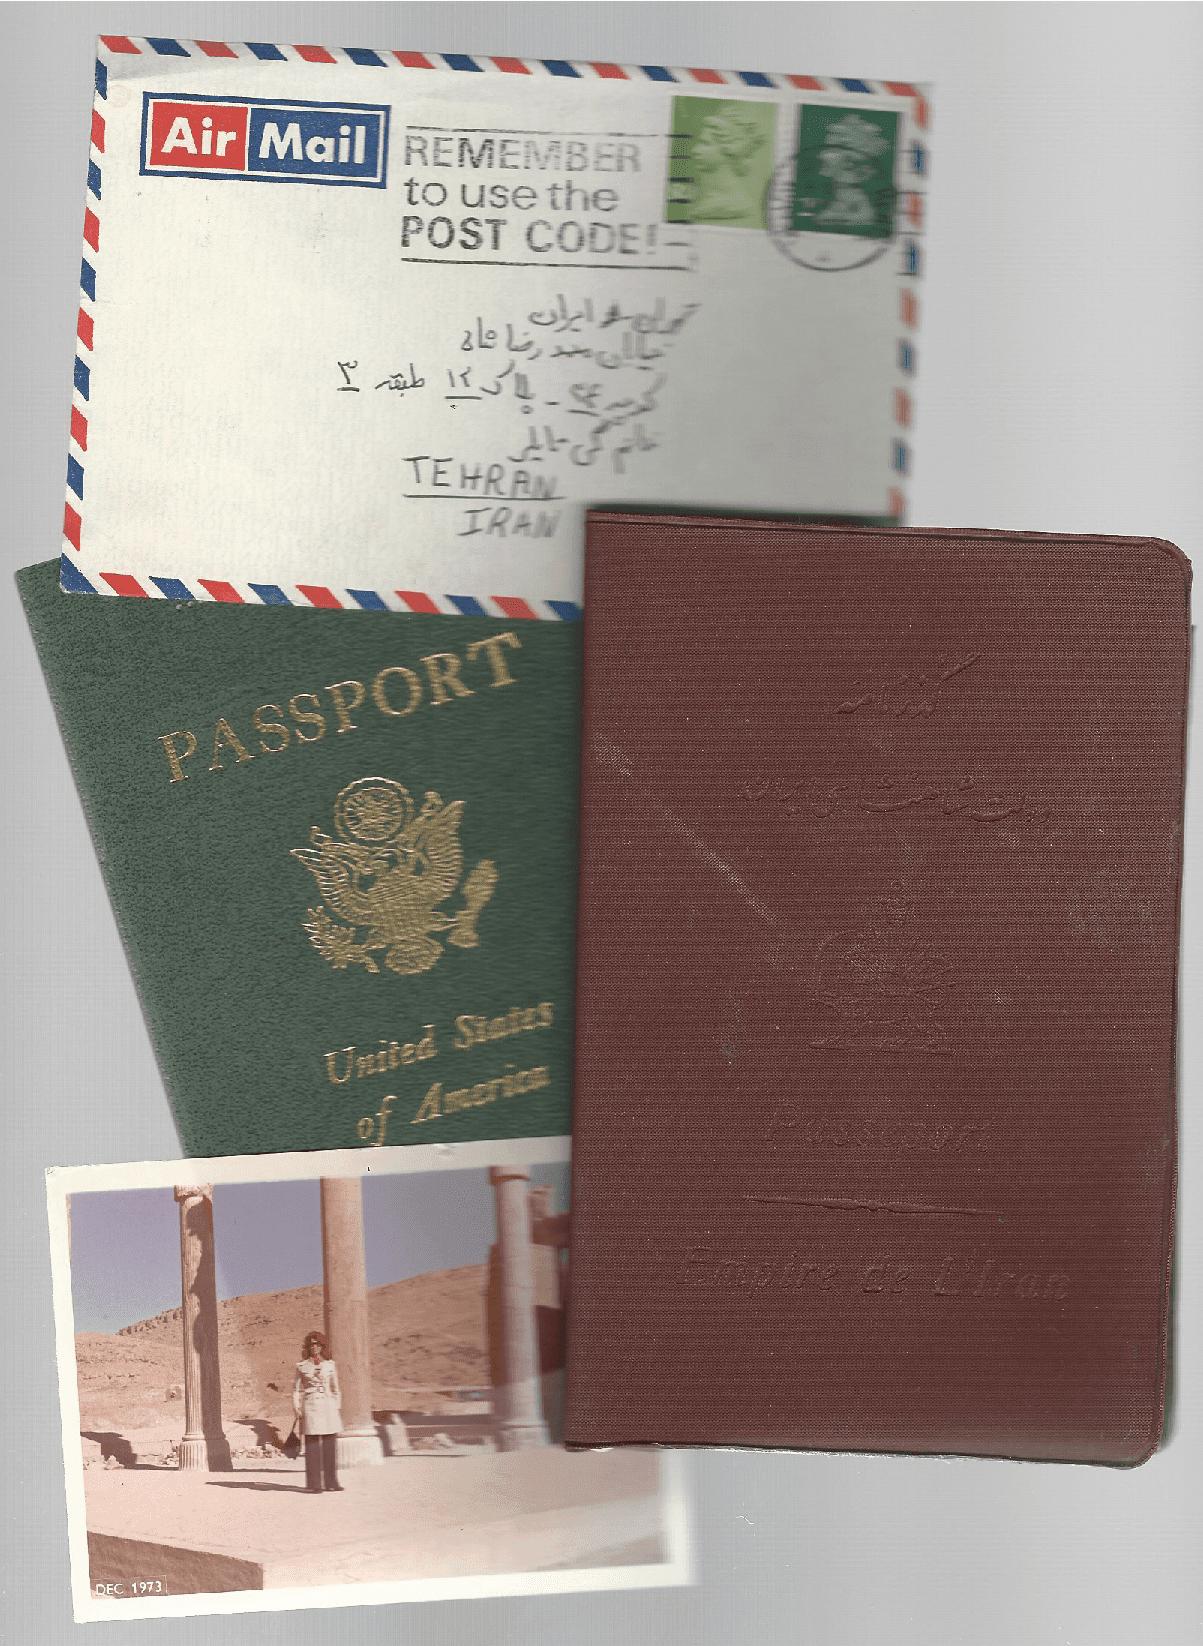 The Visa Waiver Program Improvement Act Does More Harm Than Good